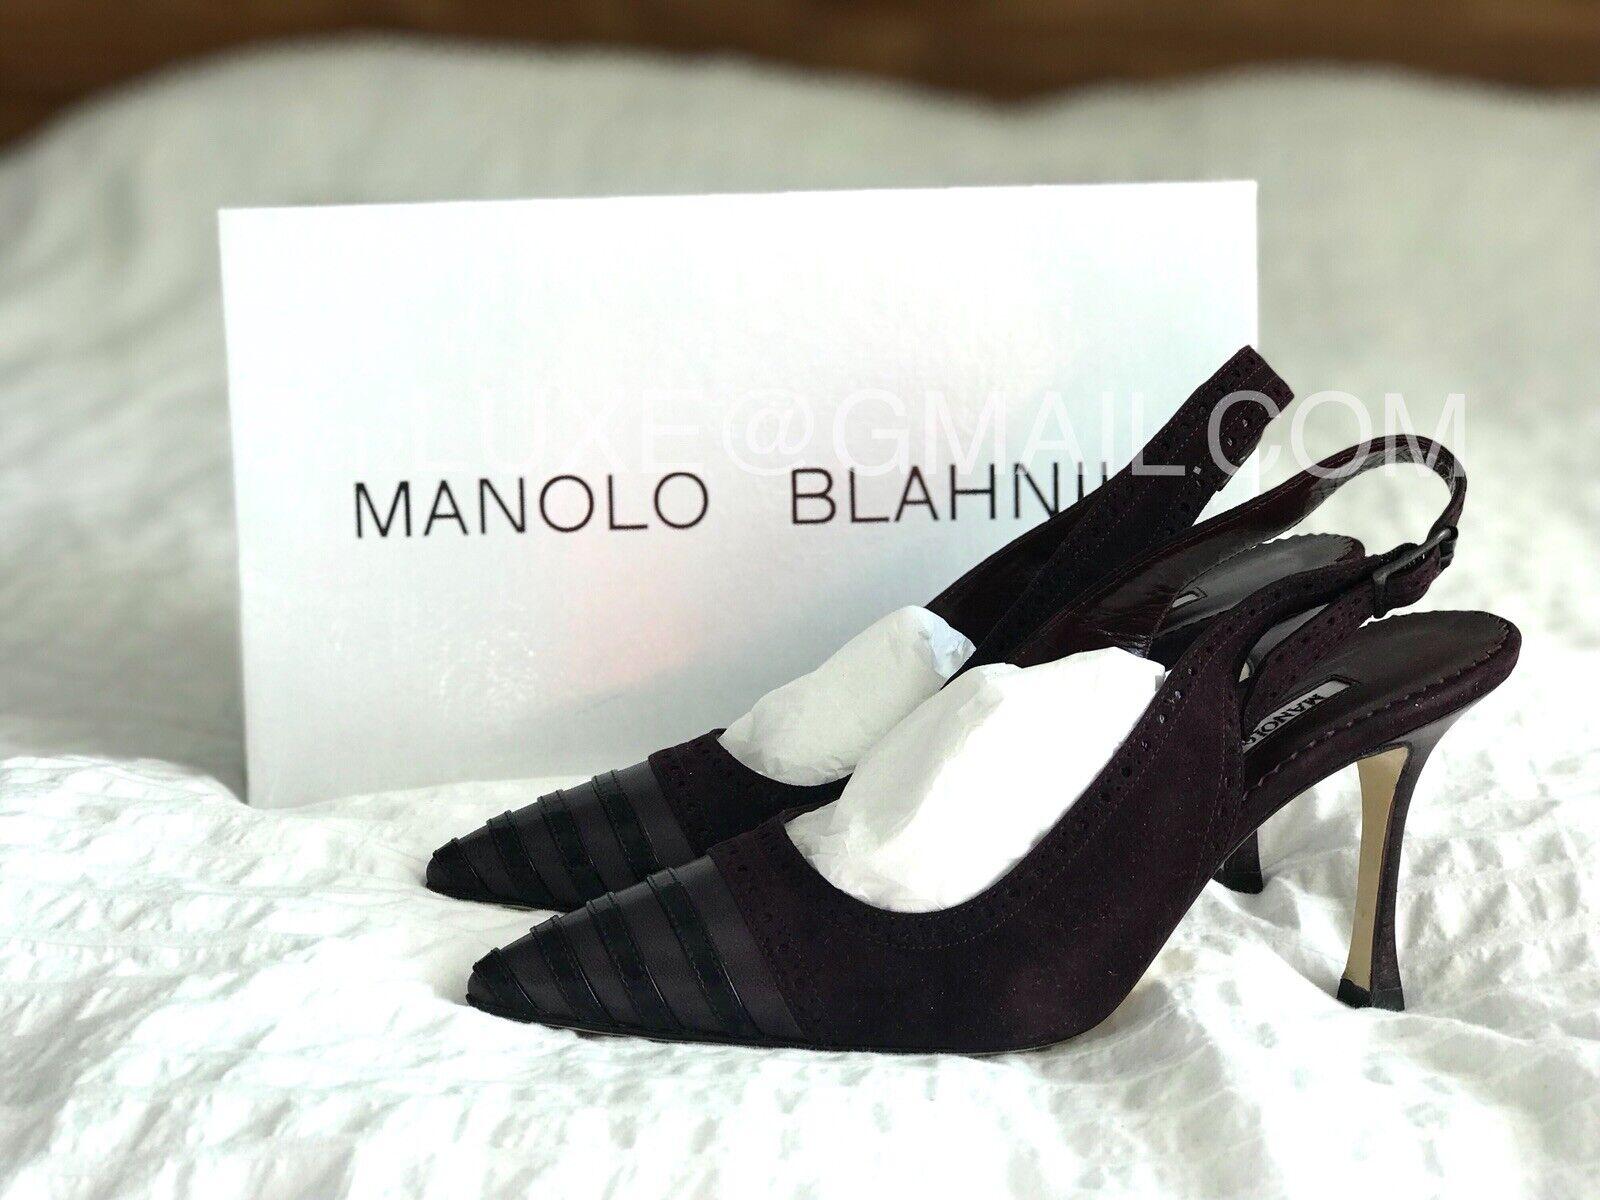 MANOLO BLAHNIK Annunziata Calf Plum Suede Camoscio Pumps Heels 36.5 6.5 BNIB